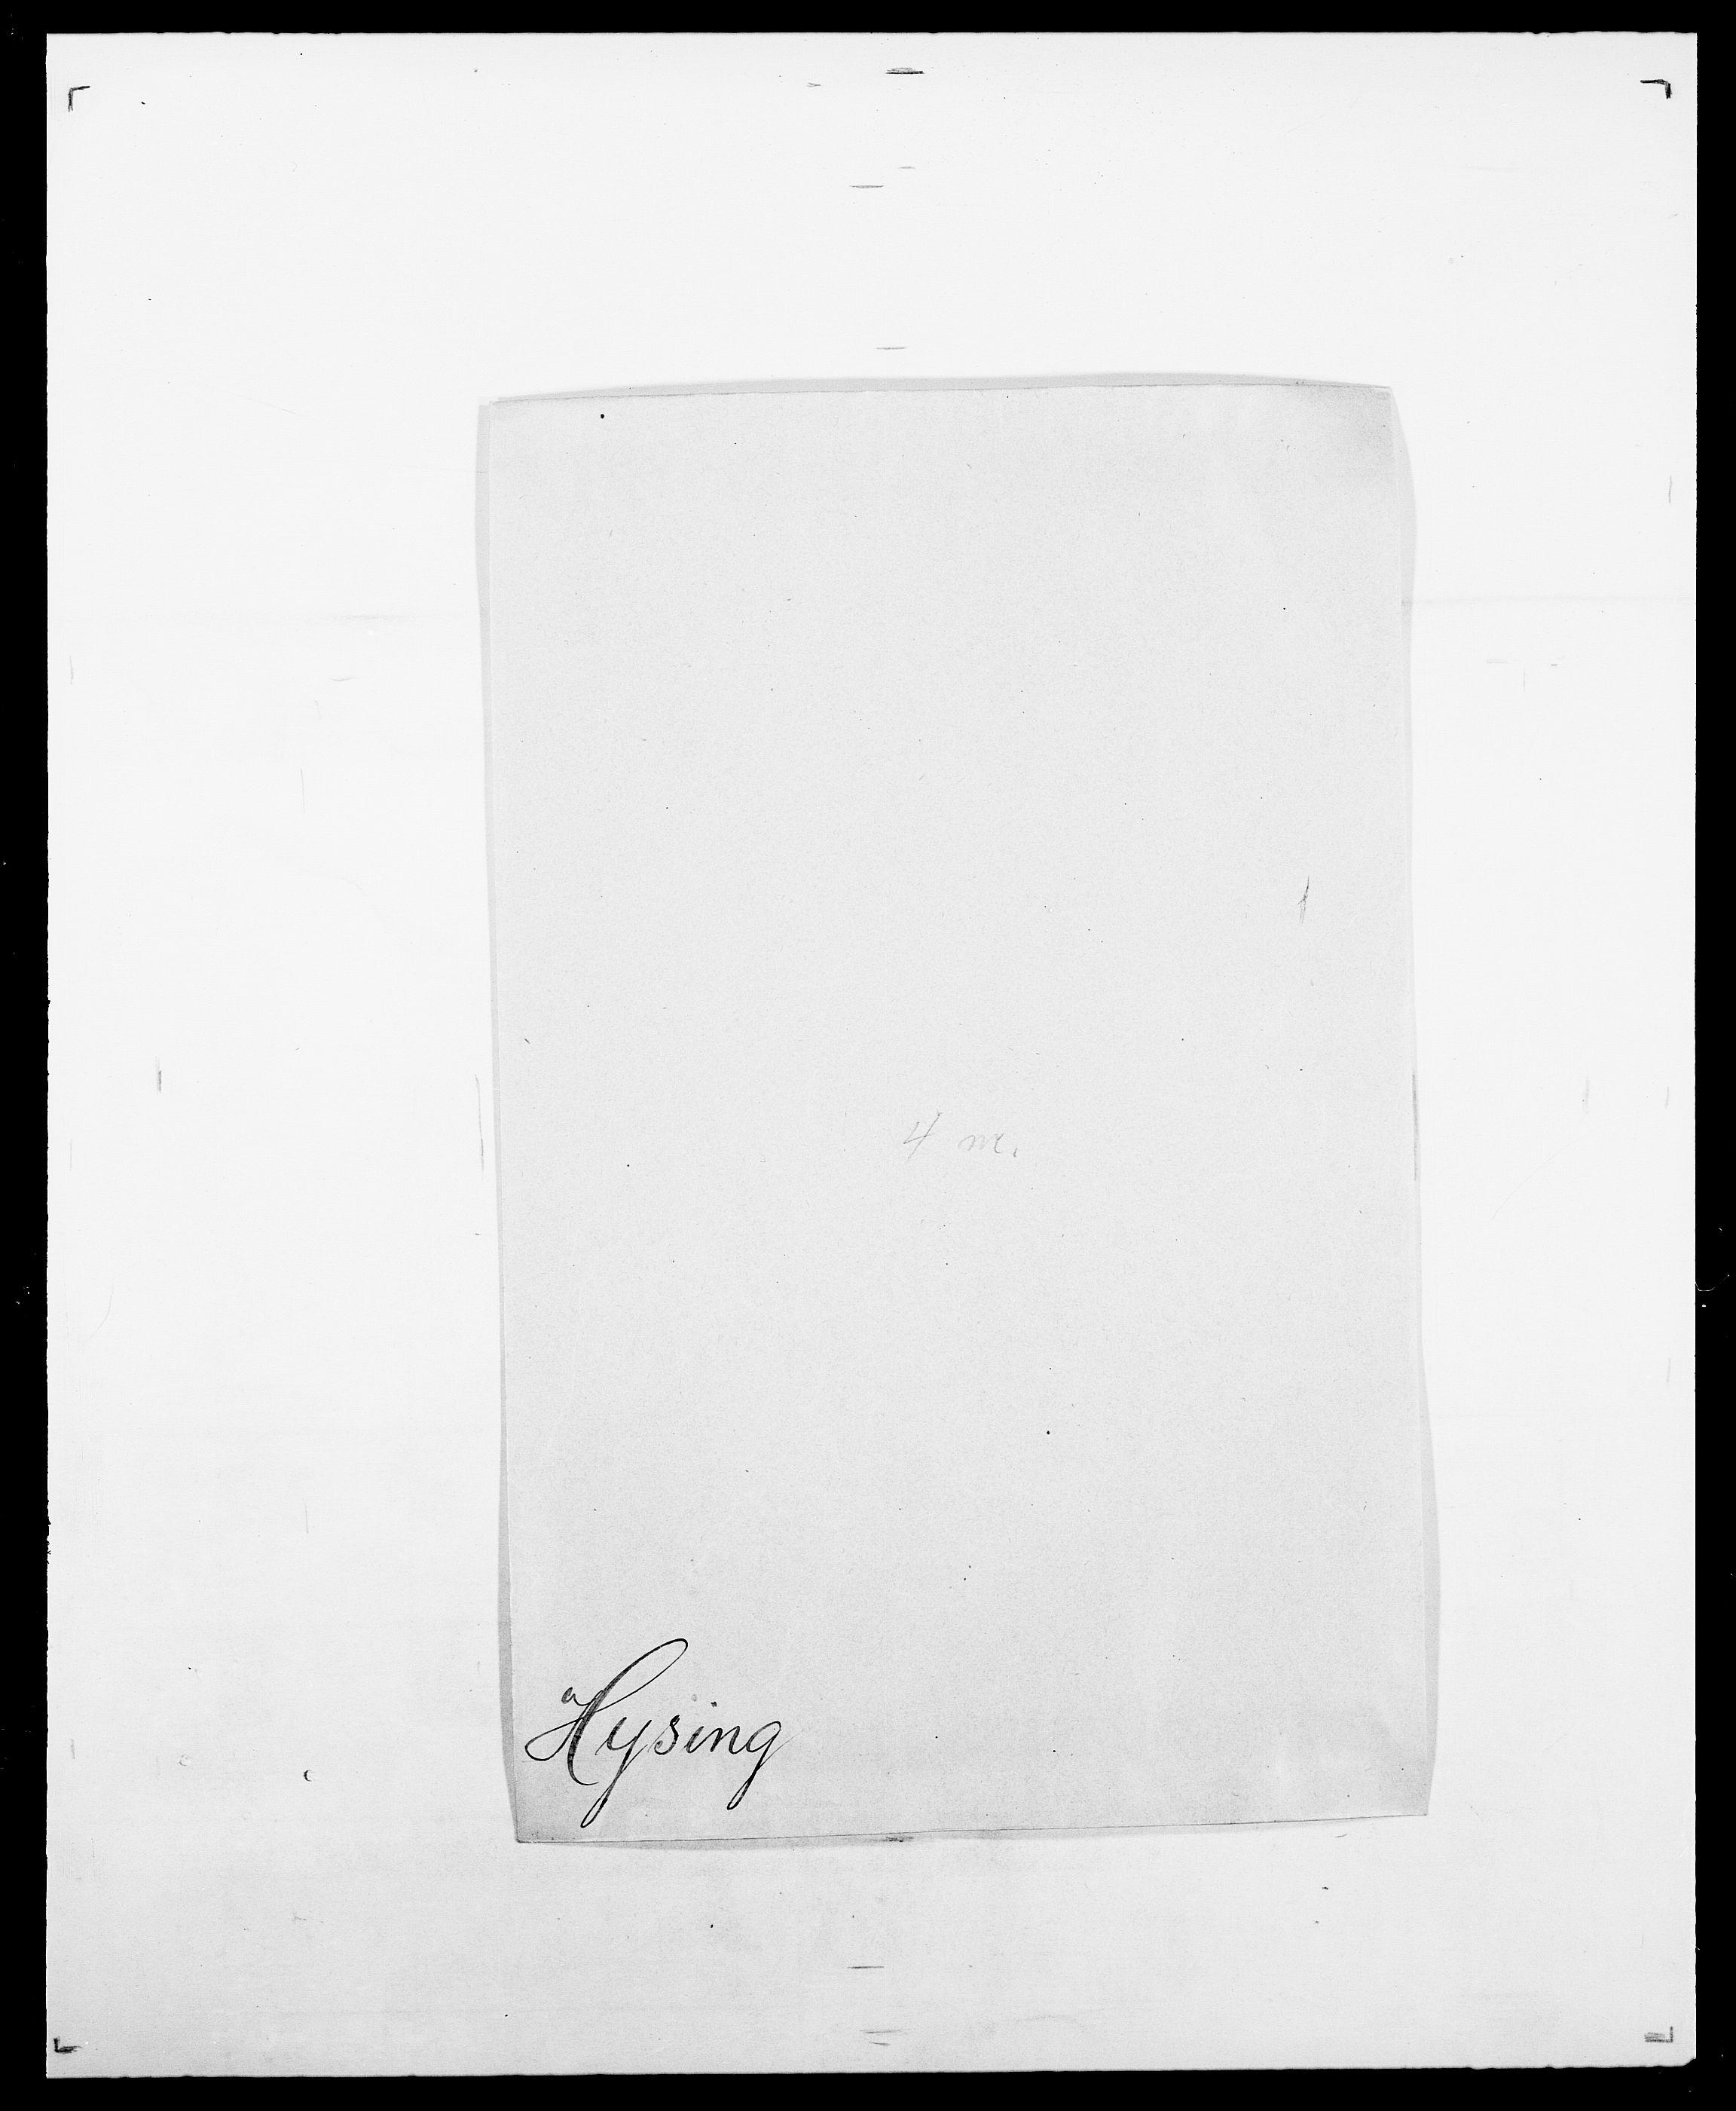 SAO, Delgobe, Charles Antoine - samling, D/Da/L0019: van der Hude - Joys, s. 293